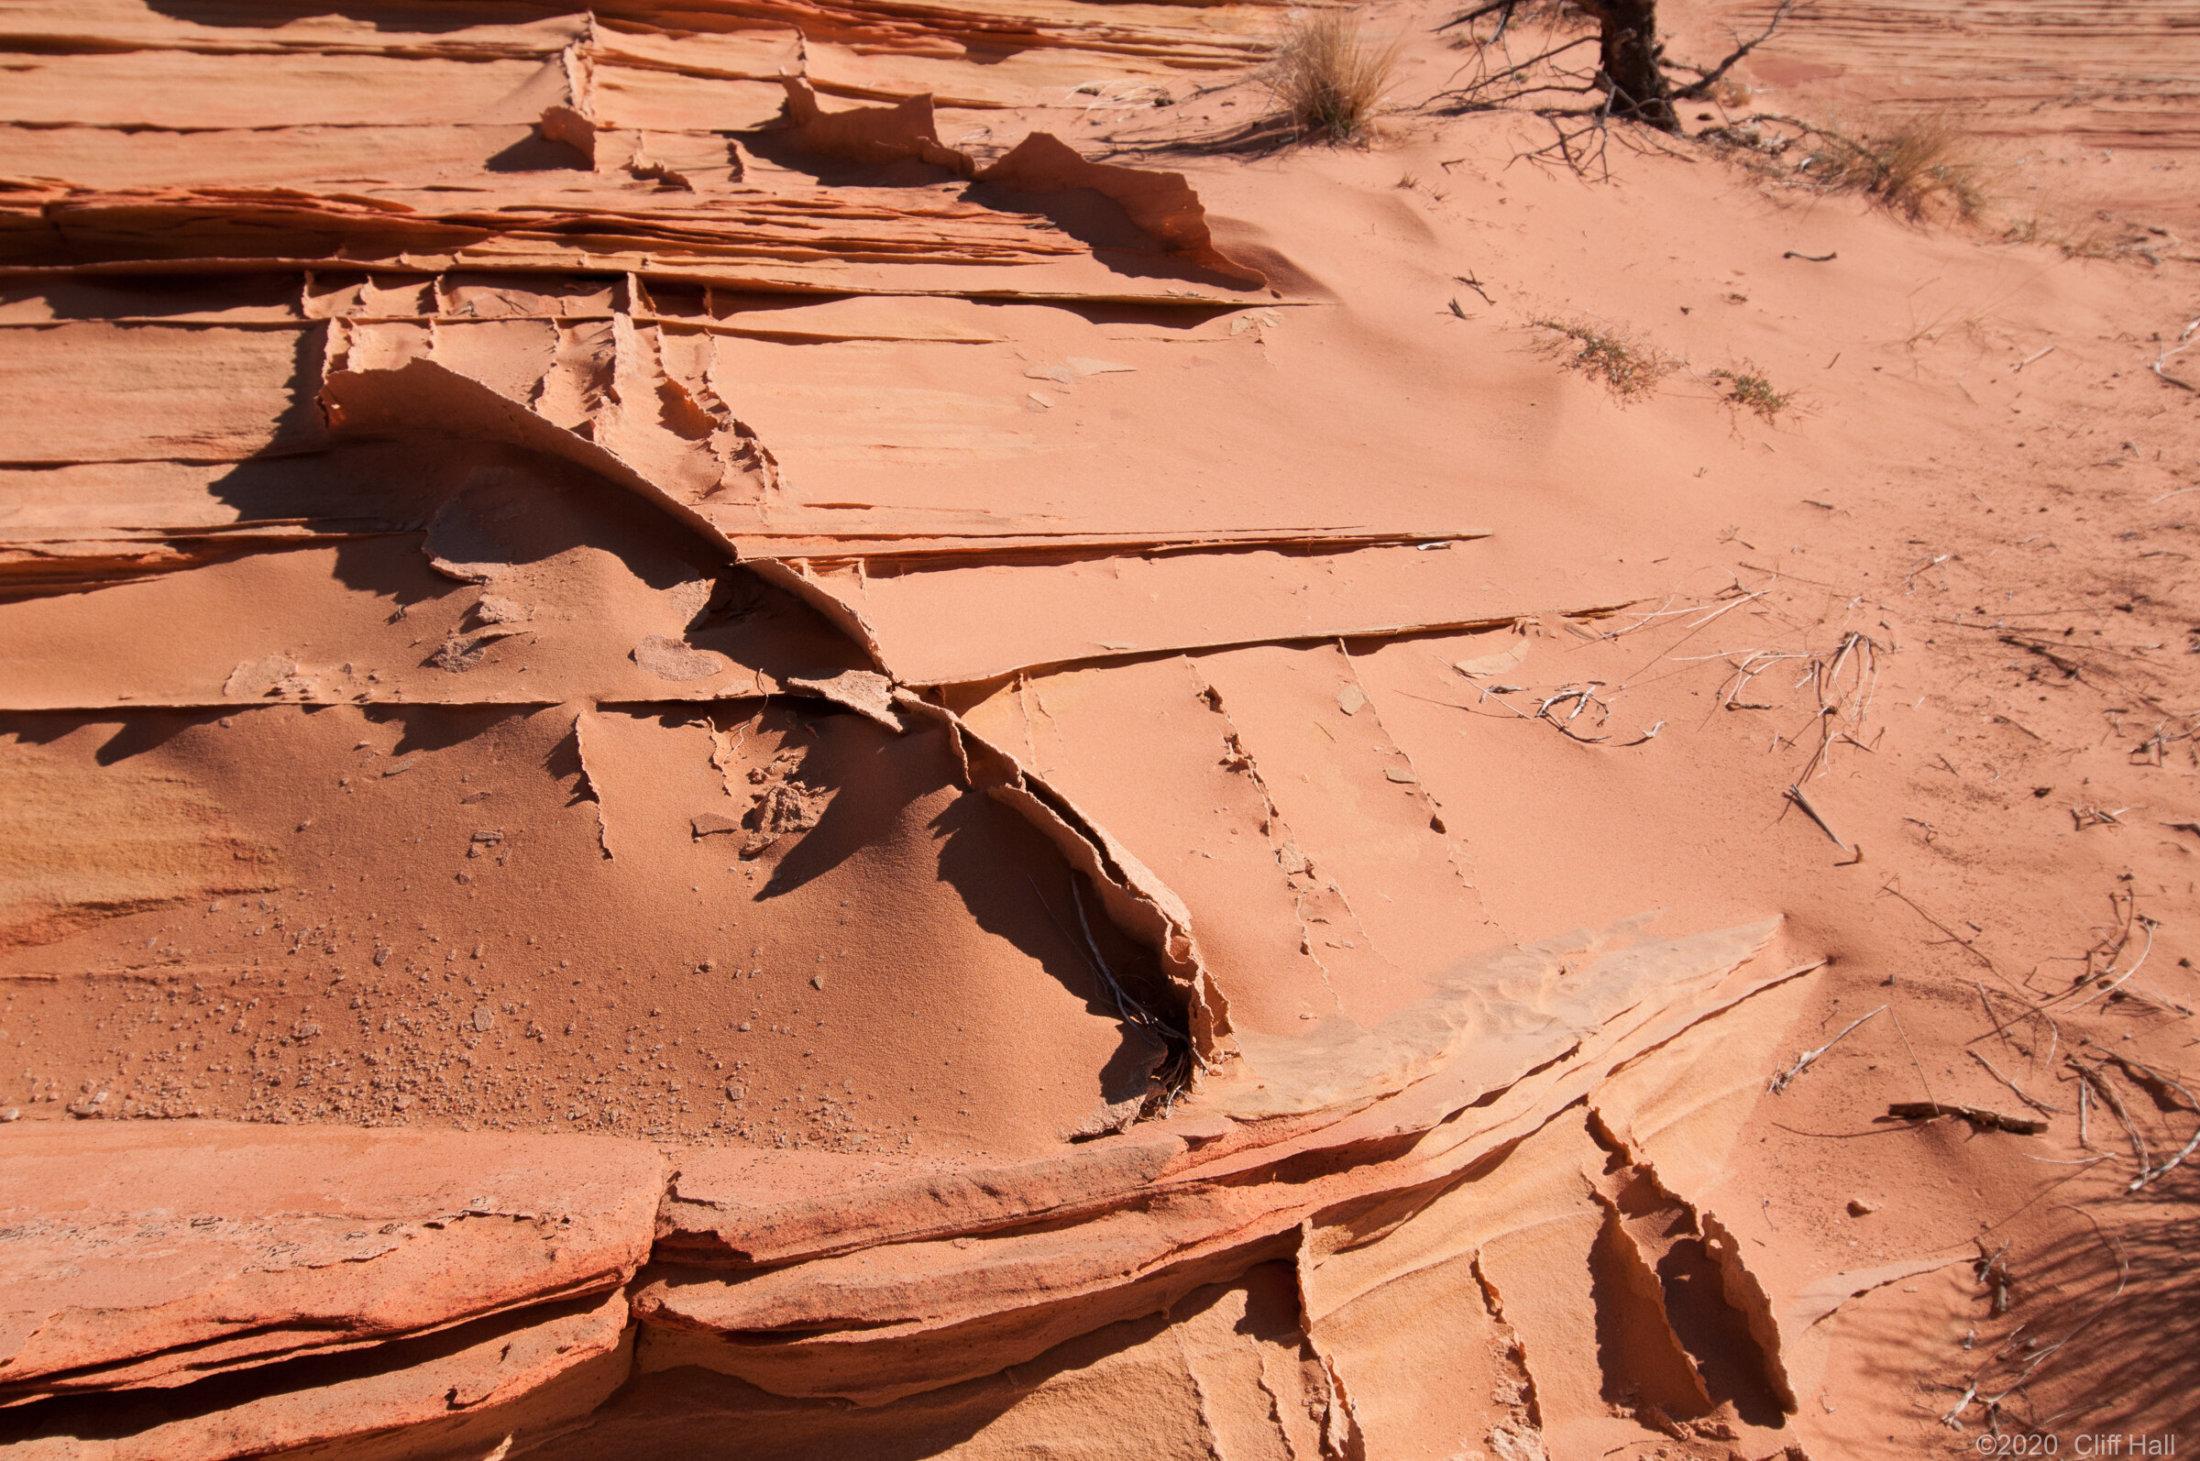 Paper thin sandstone fins